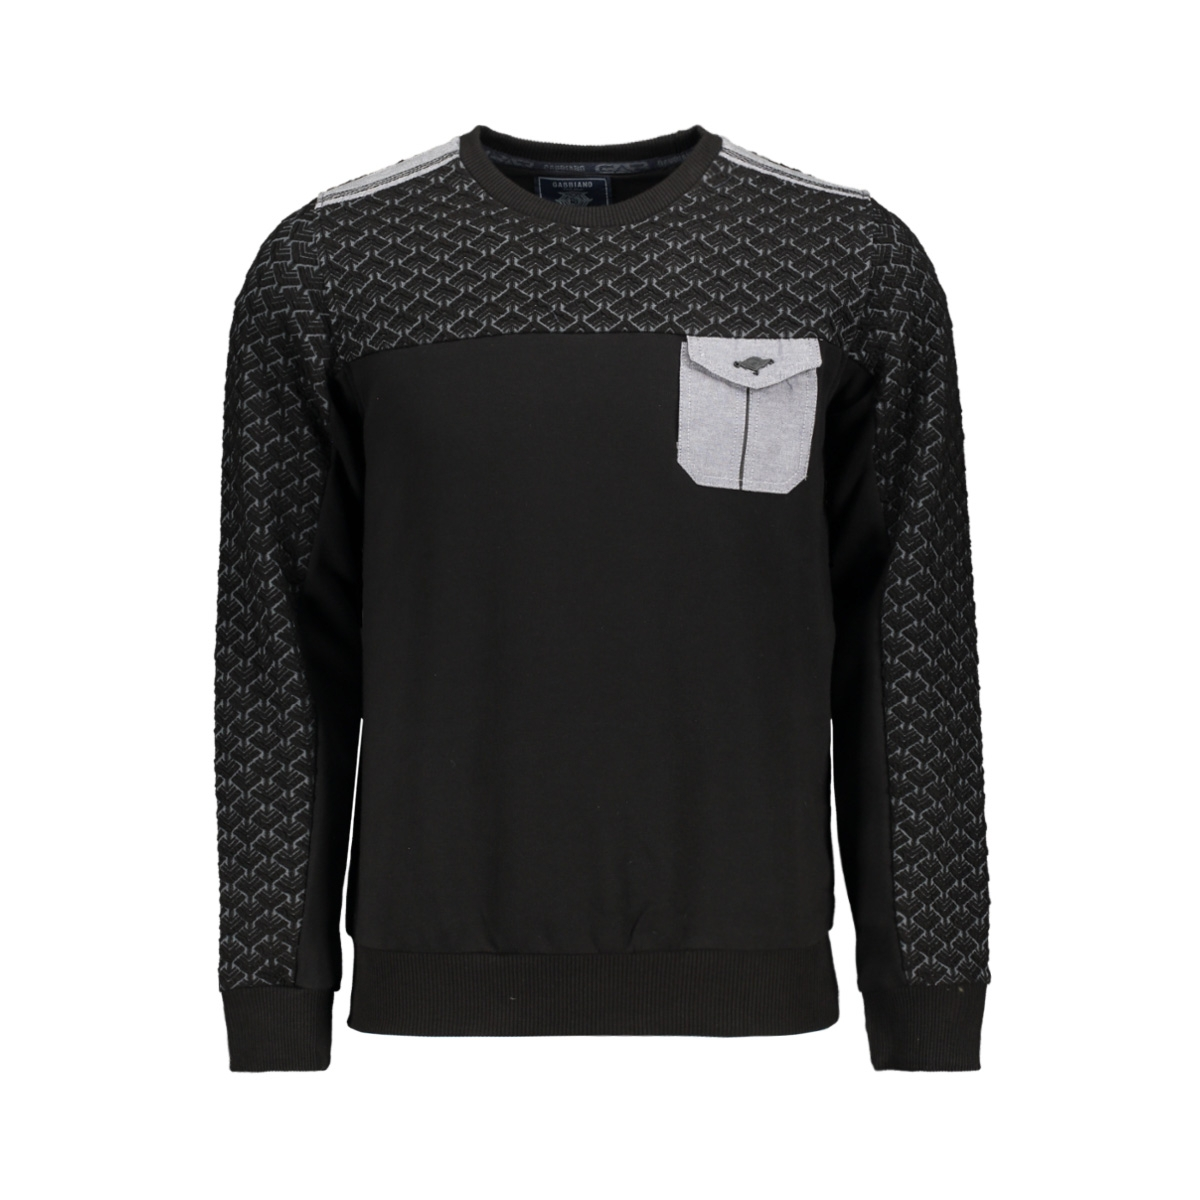 sweater 77086 gabbiano sweater black